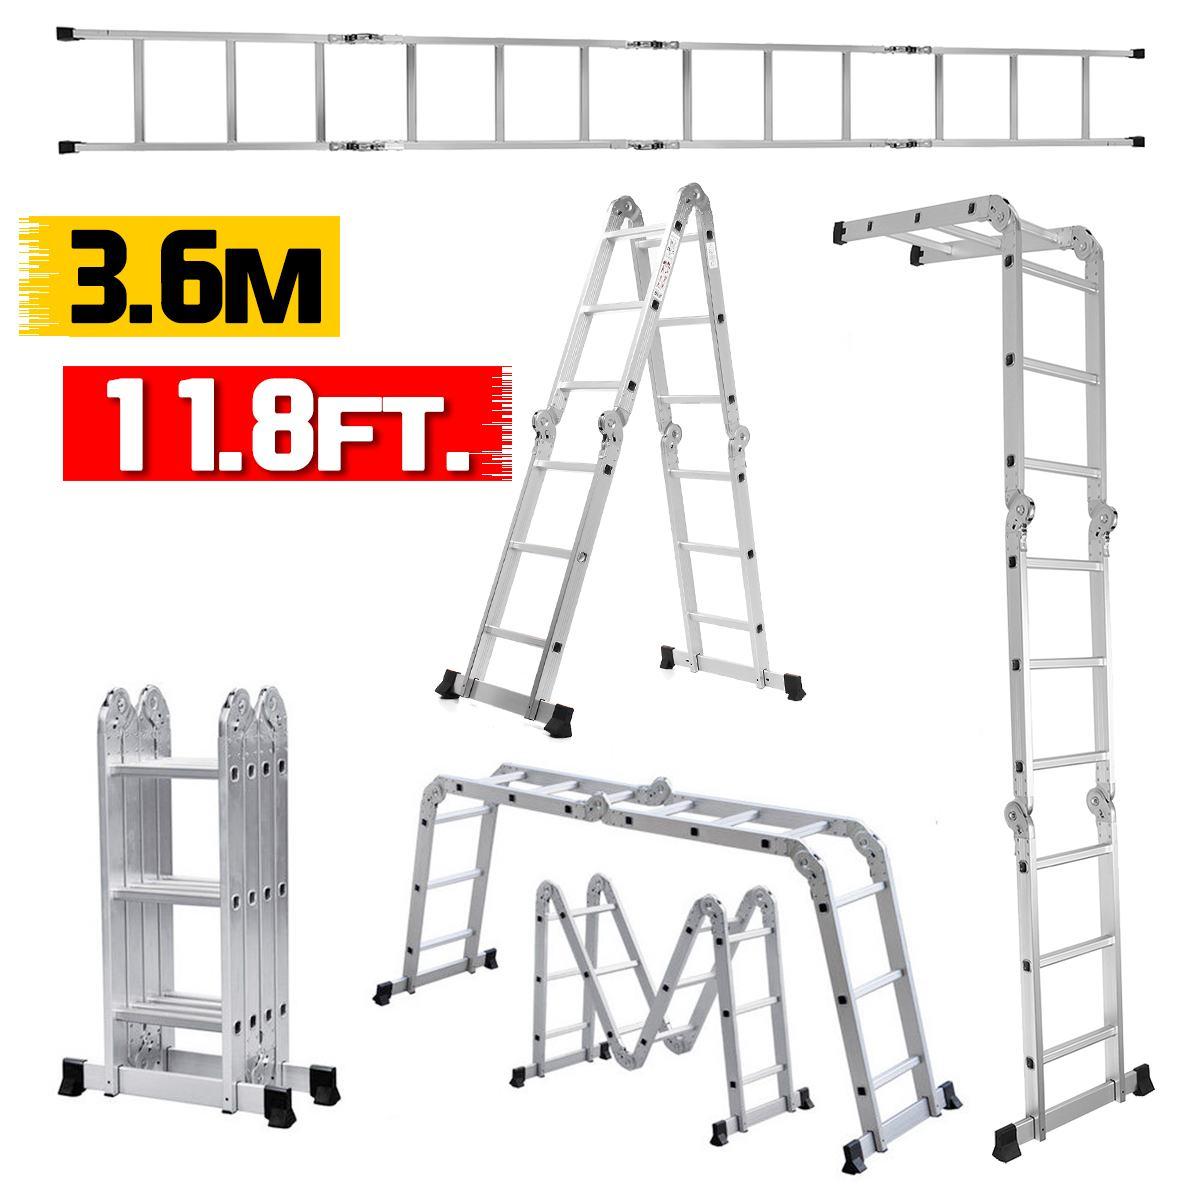 3.6m 12.5Ft Telescopic Ladder Folding Ladder Aluminum Extension Tall Ladder Multifunctional Single Extension Ladder Tool